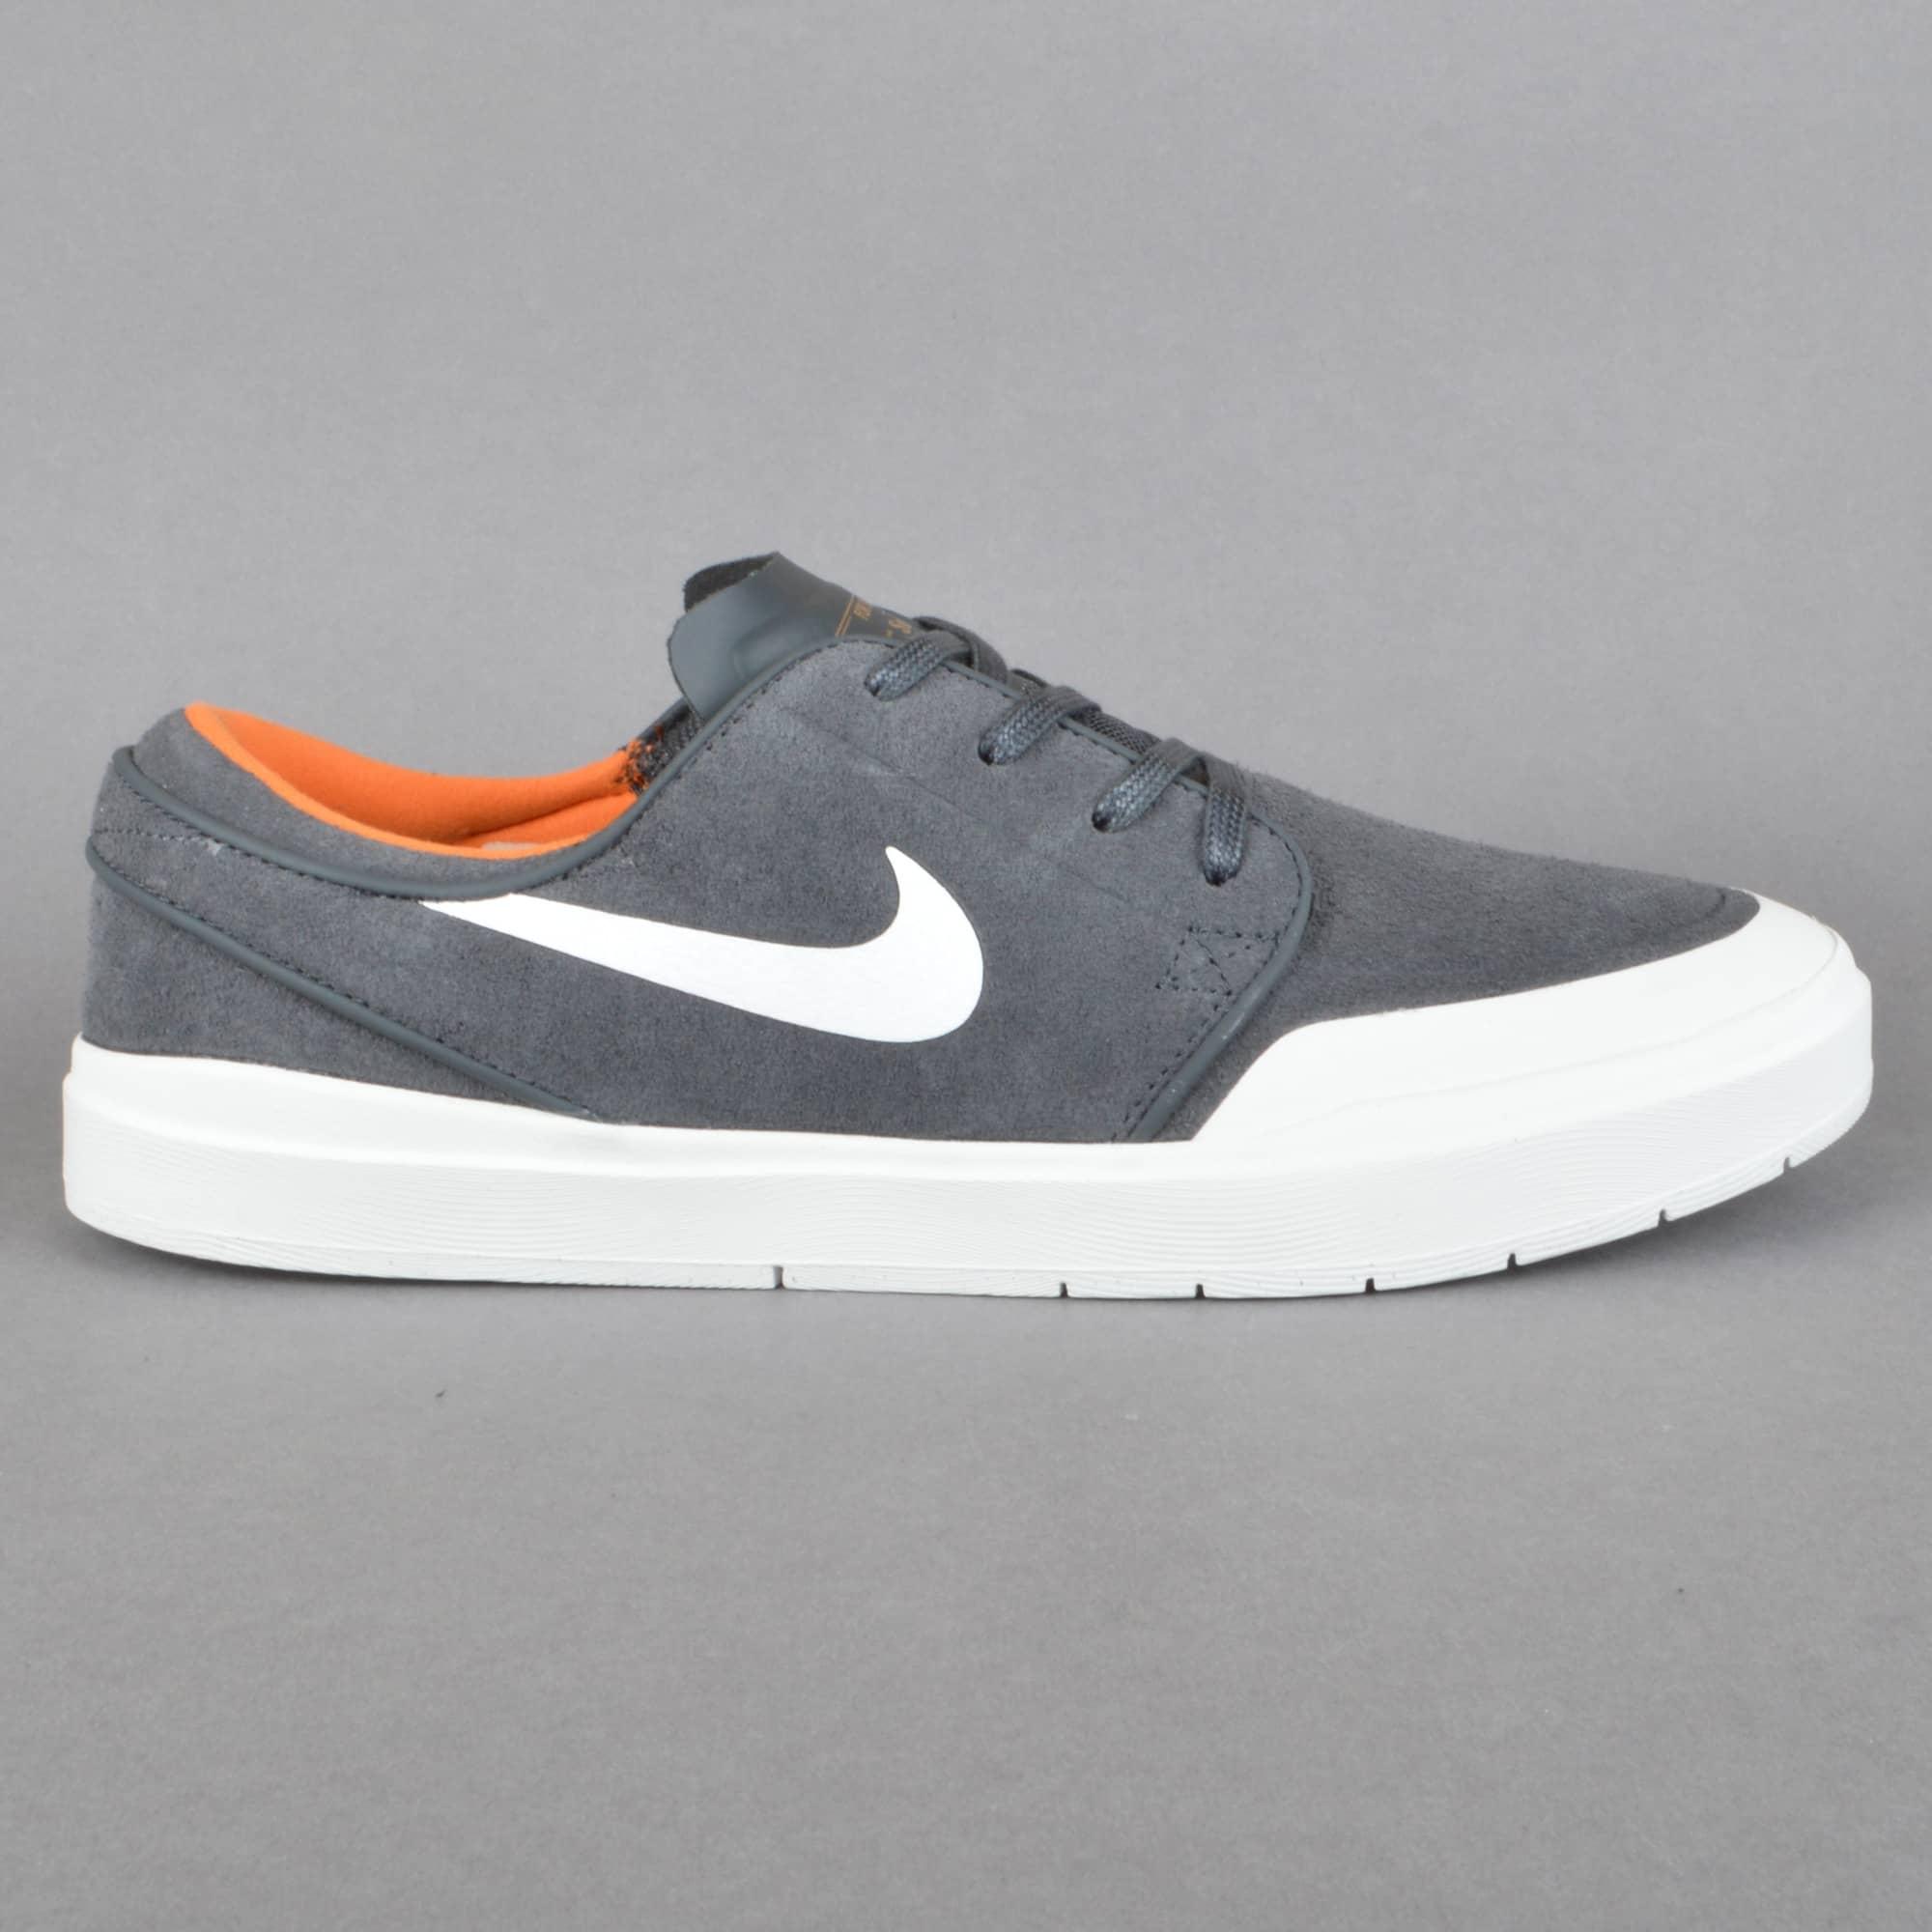 Nike SB Stefan Janoski Hyperfeel XT Skate Shoes - Anthracite/White ...